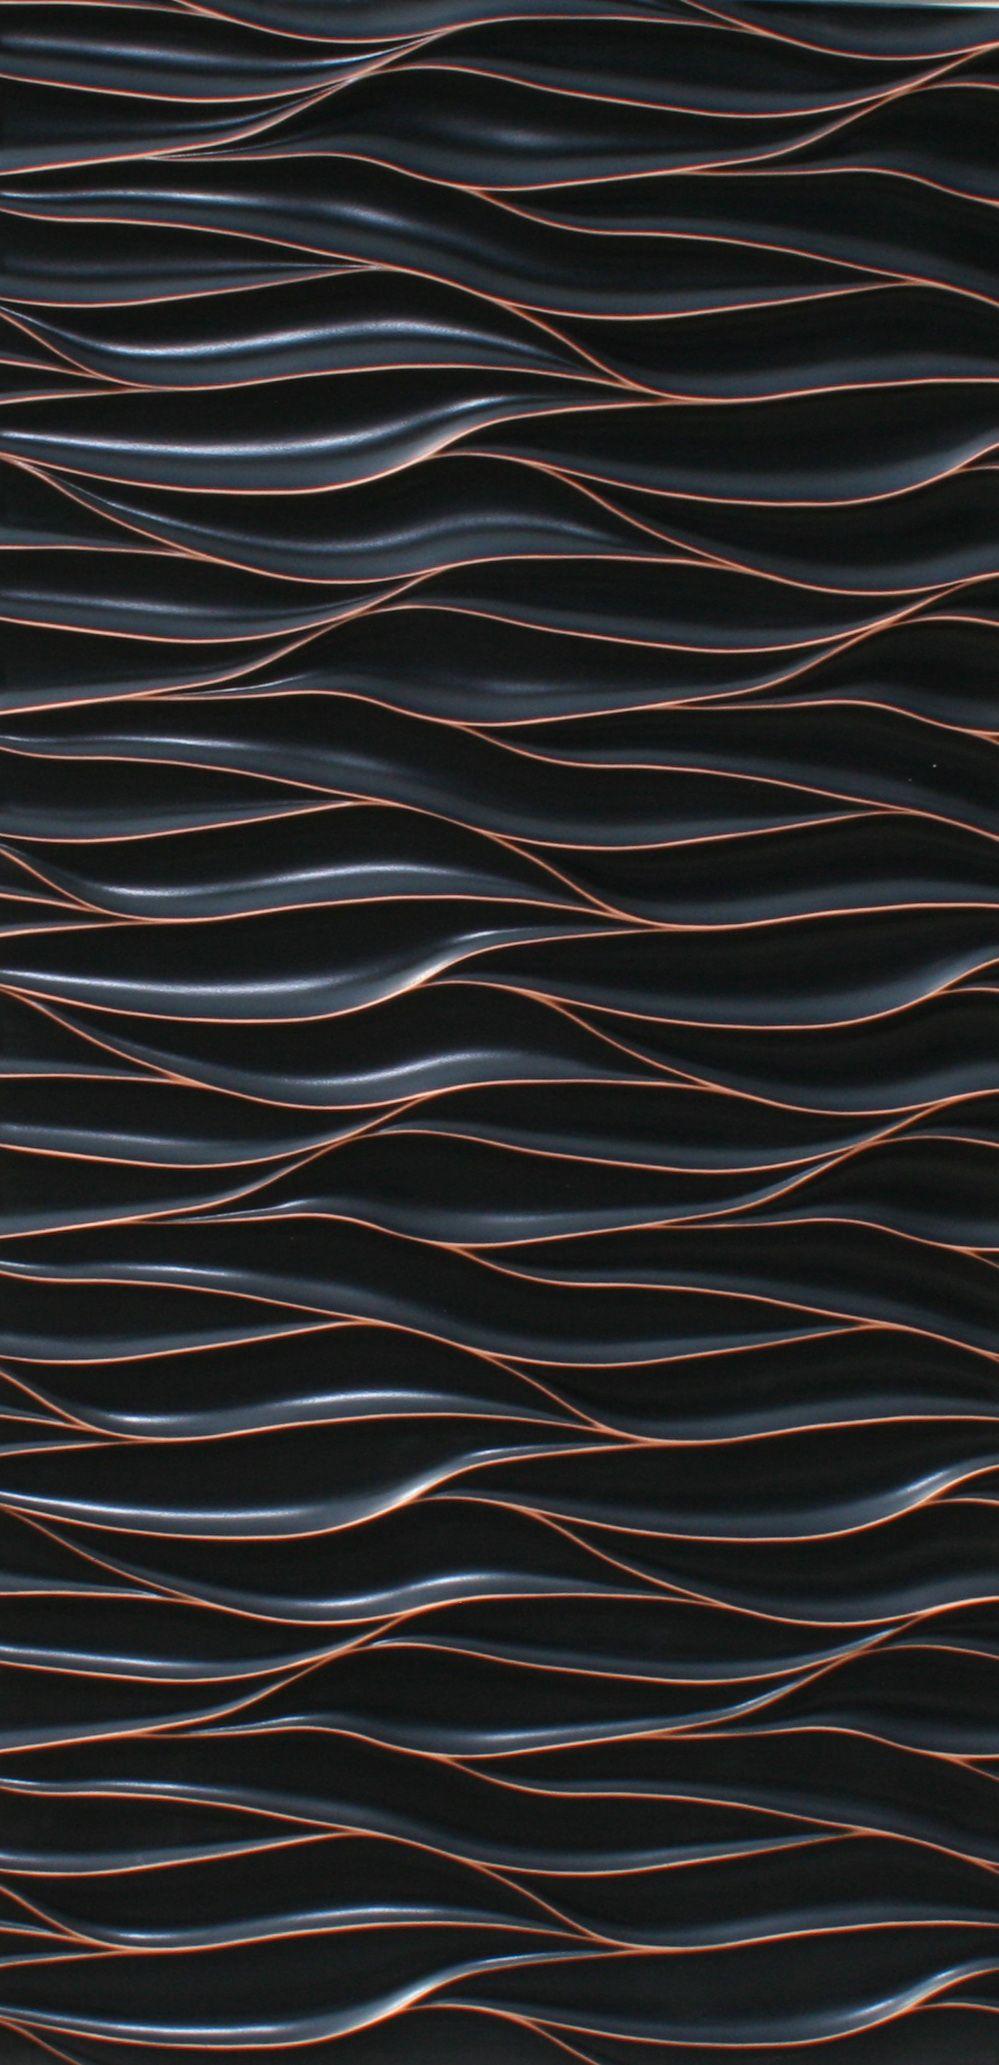 Textured Wall Bio 005 From Interlam Interlam Styles